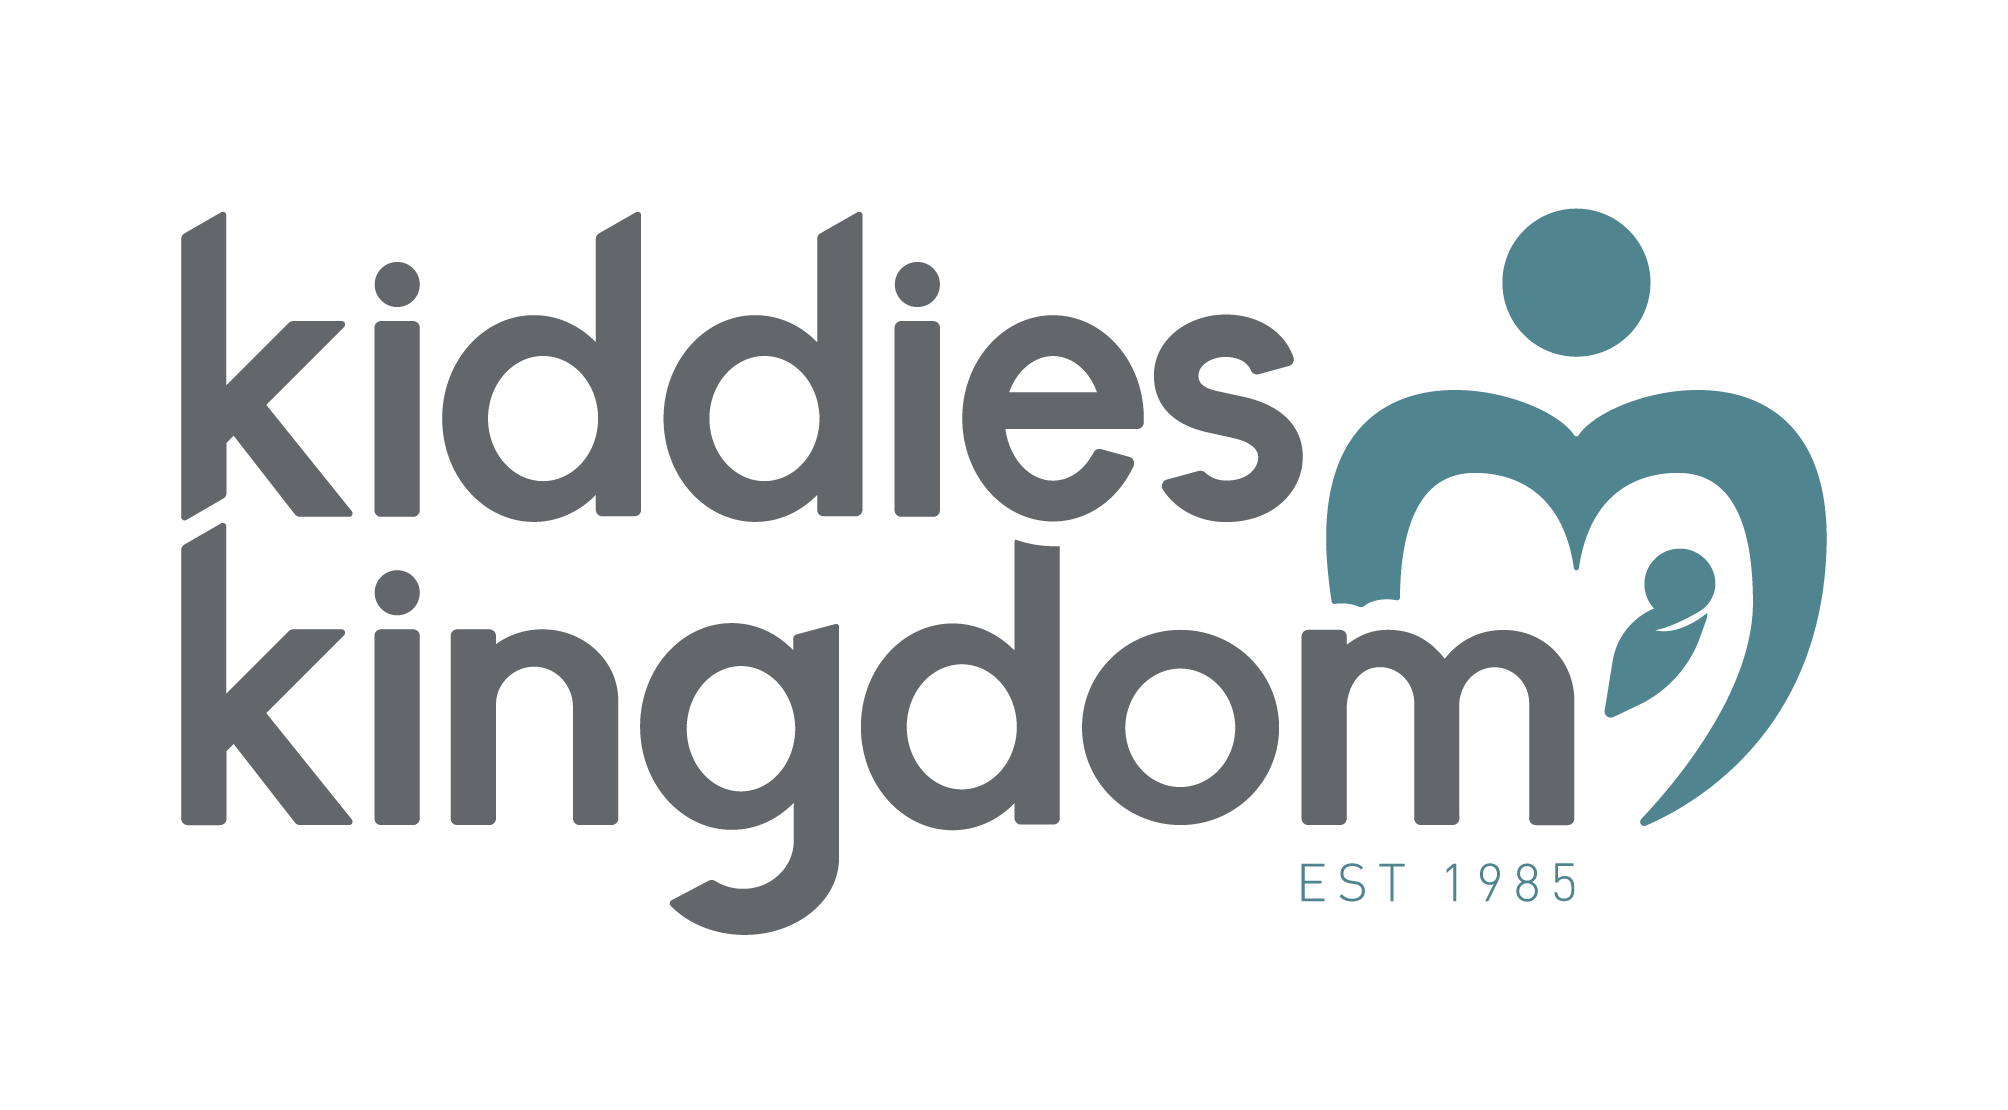 Read Kiddies Kingdom Reviews